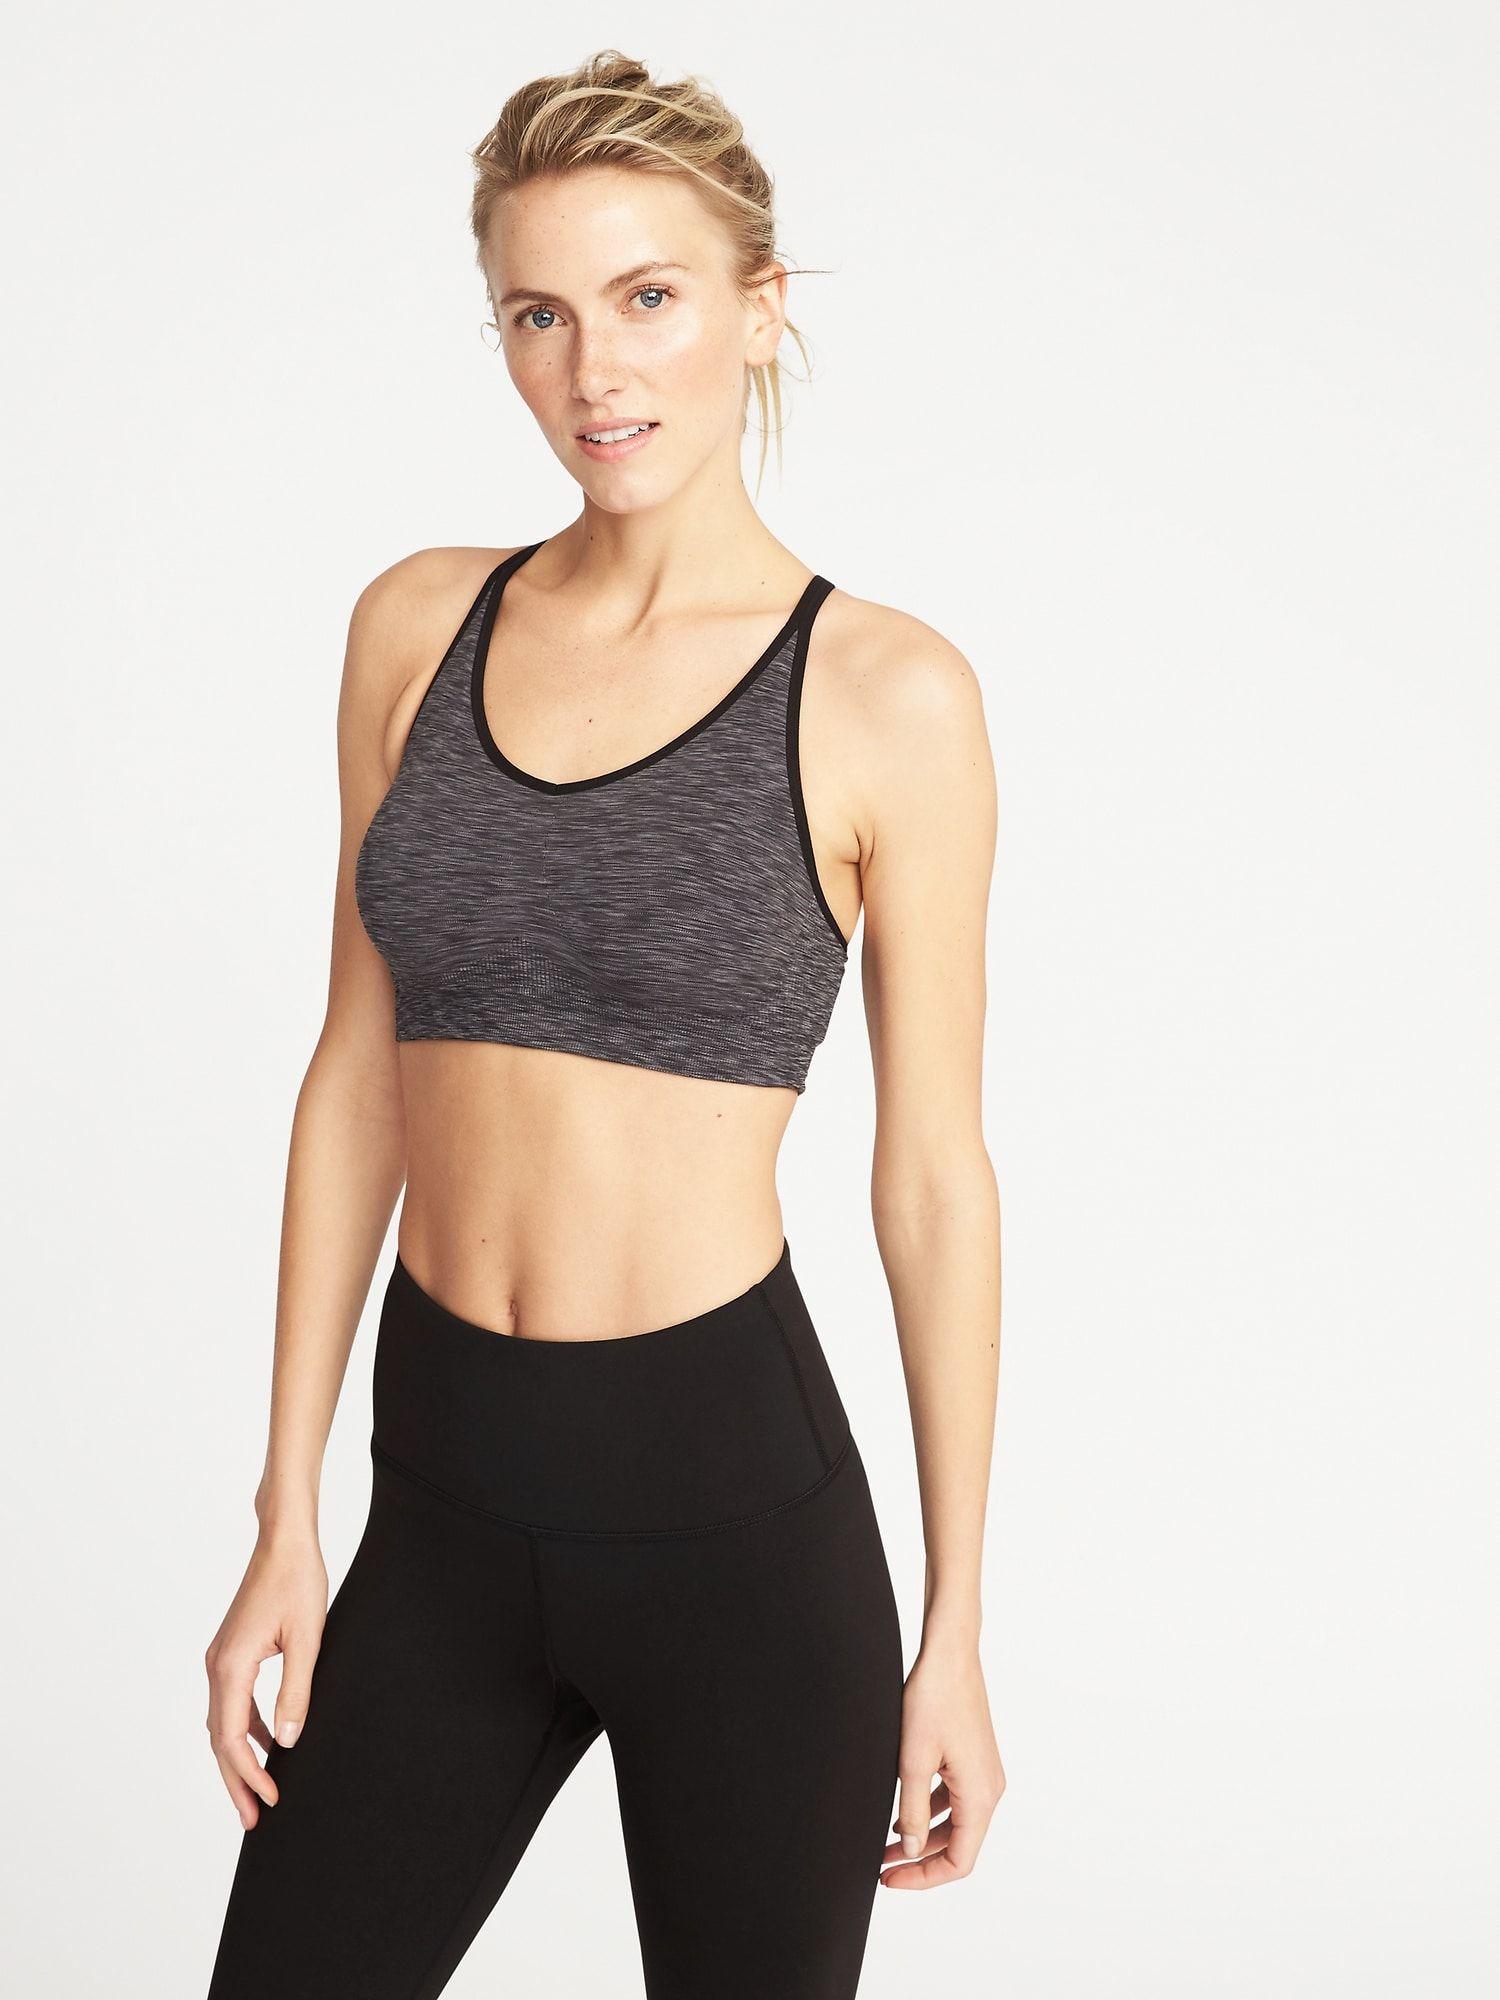 Seamless Light Support Sports Bra for Women Sports bra